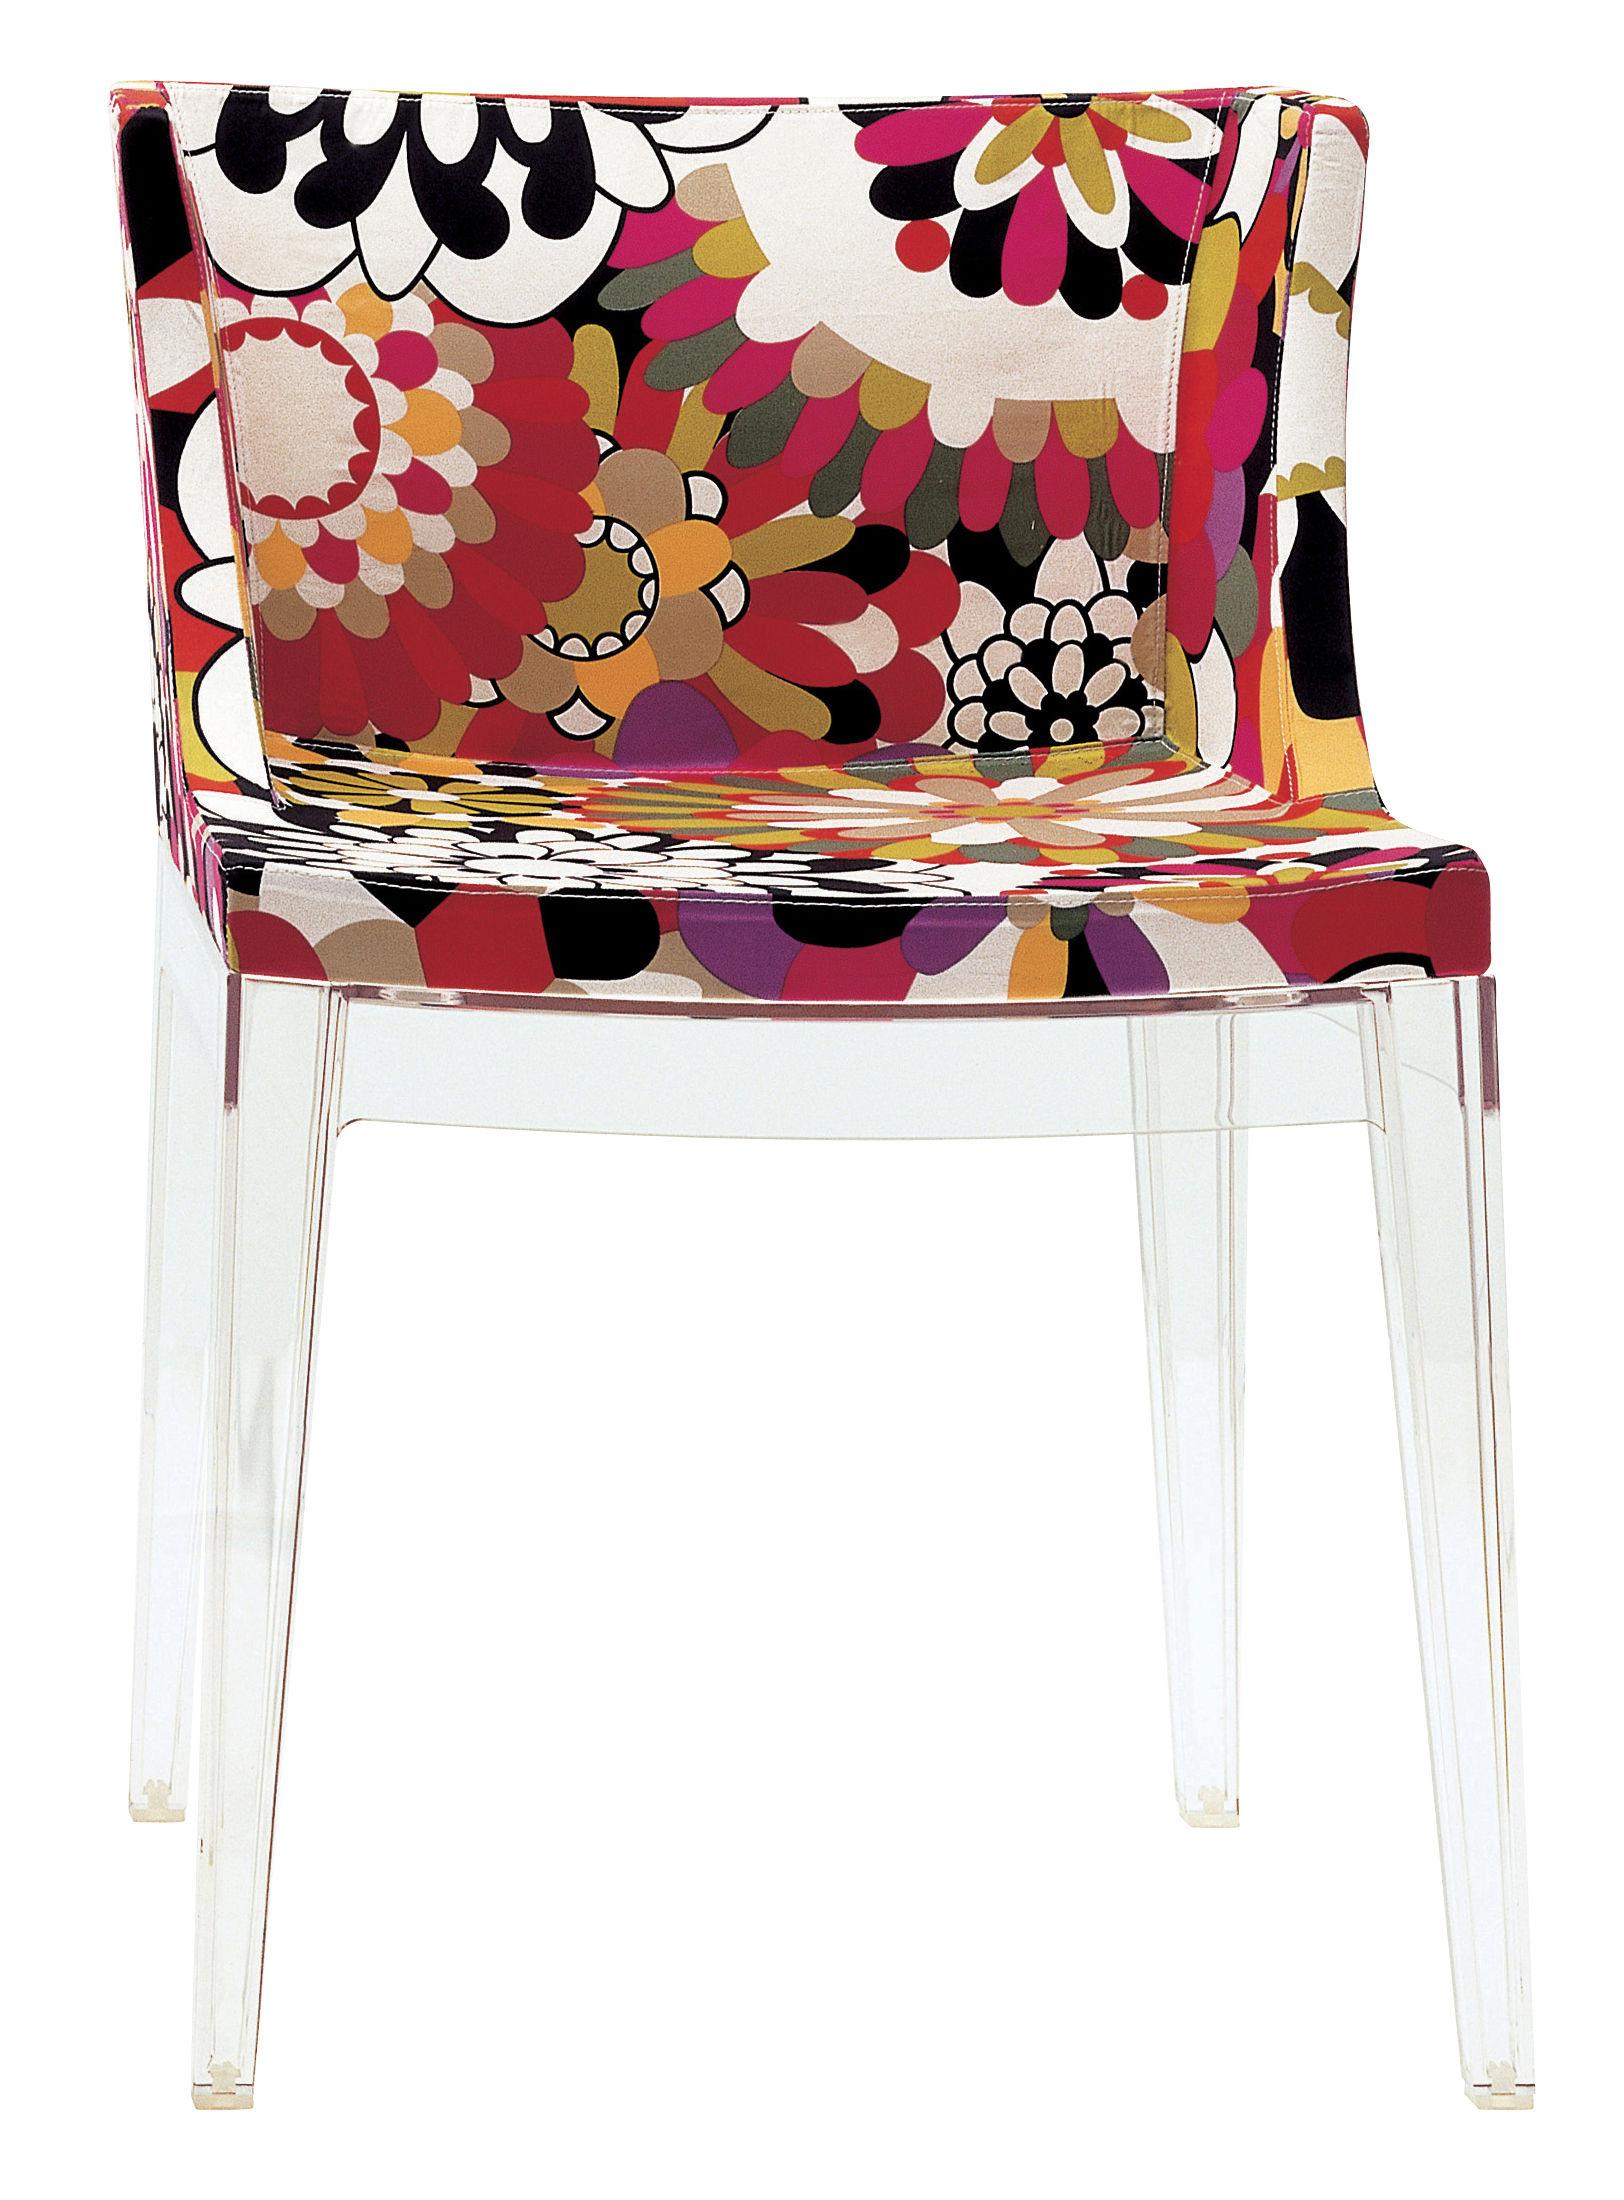 Möbel - Stühle  - Mademoiselle Missoni Gepolsterter Sessel - Kartell - Blumen in Rottönen - Baumwolle, Polykarbonat, Polyurhethan